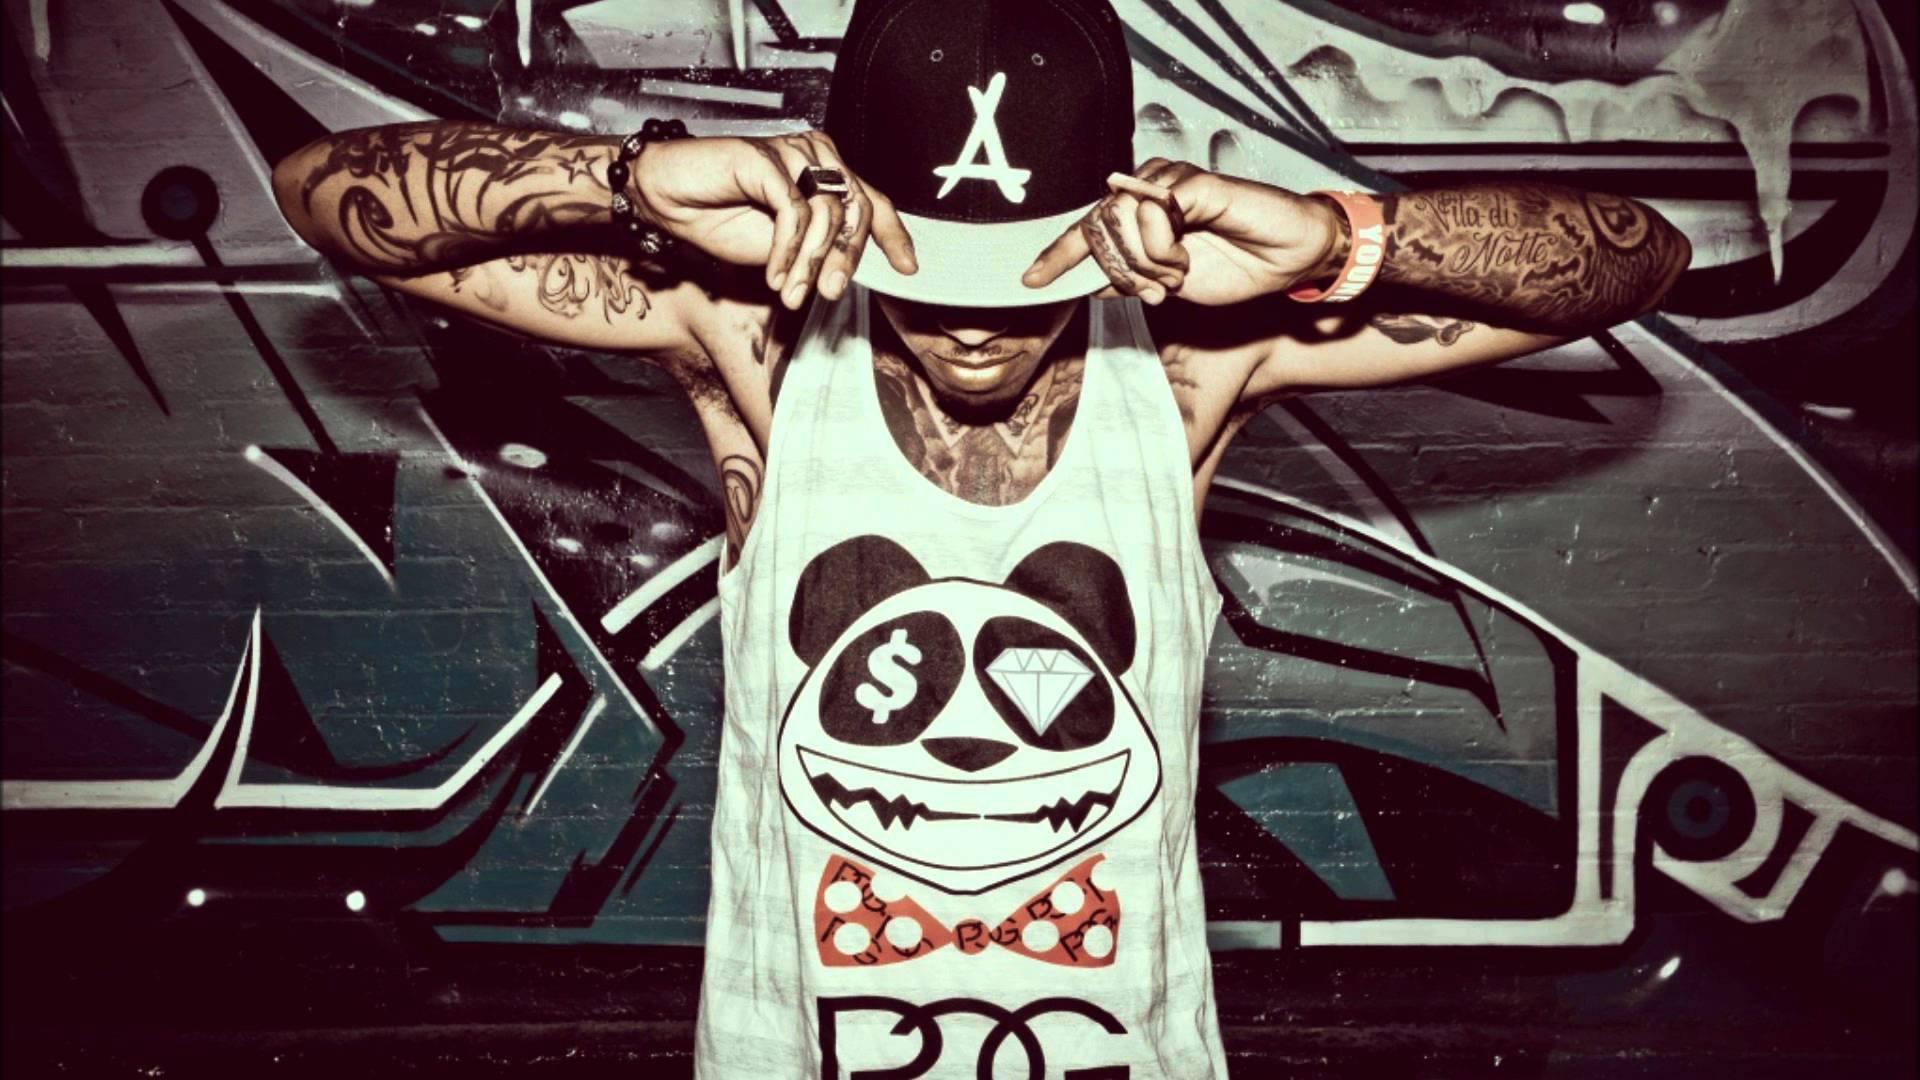 KID INK rapper rap hip hop disc jockey d-j 1kink gangsta ...